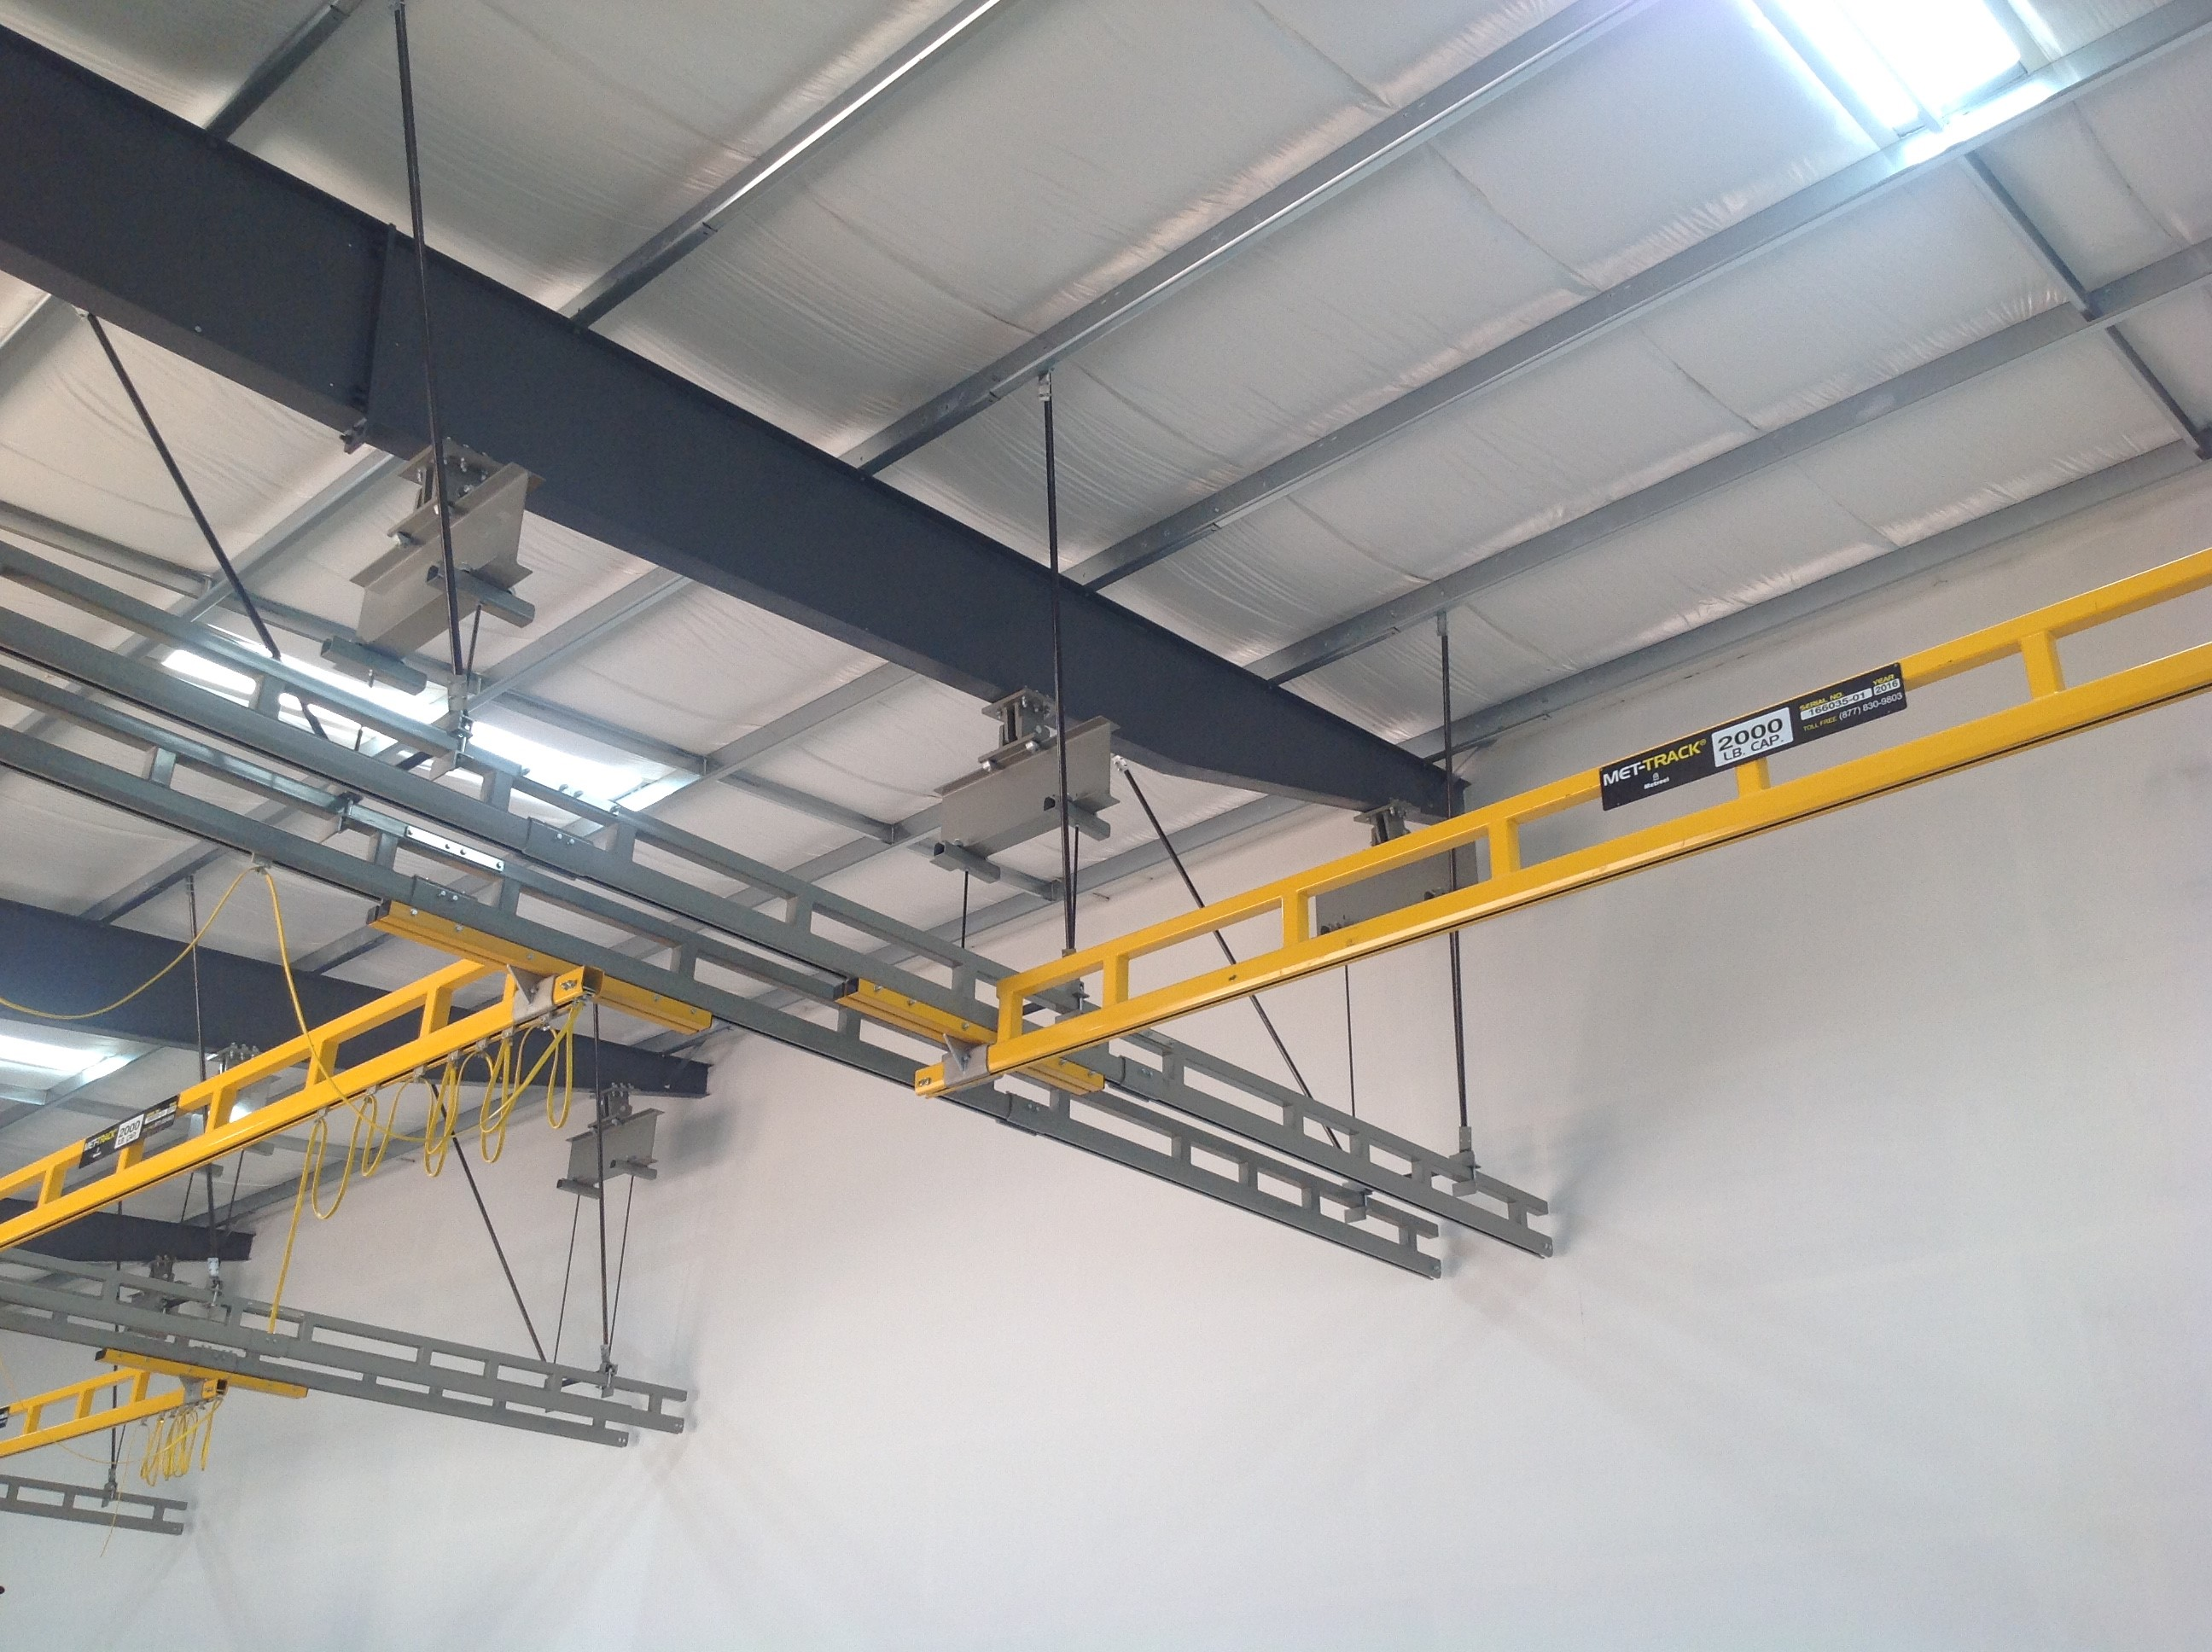 Workstation Crane Systems : Find a distributor workstation bridge crane system